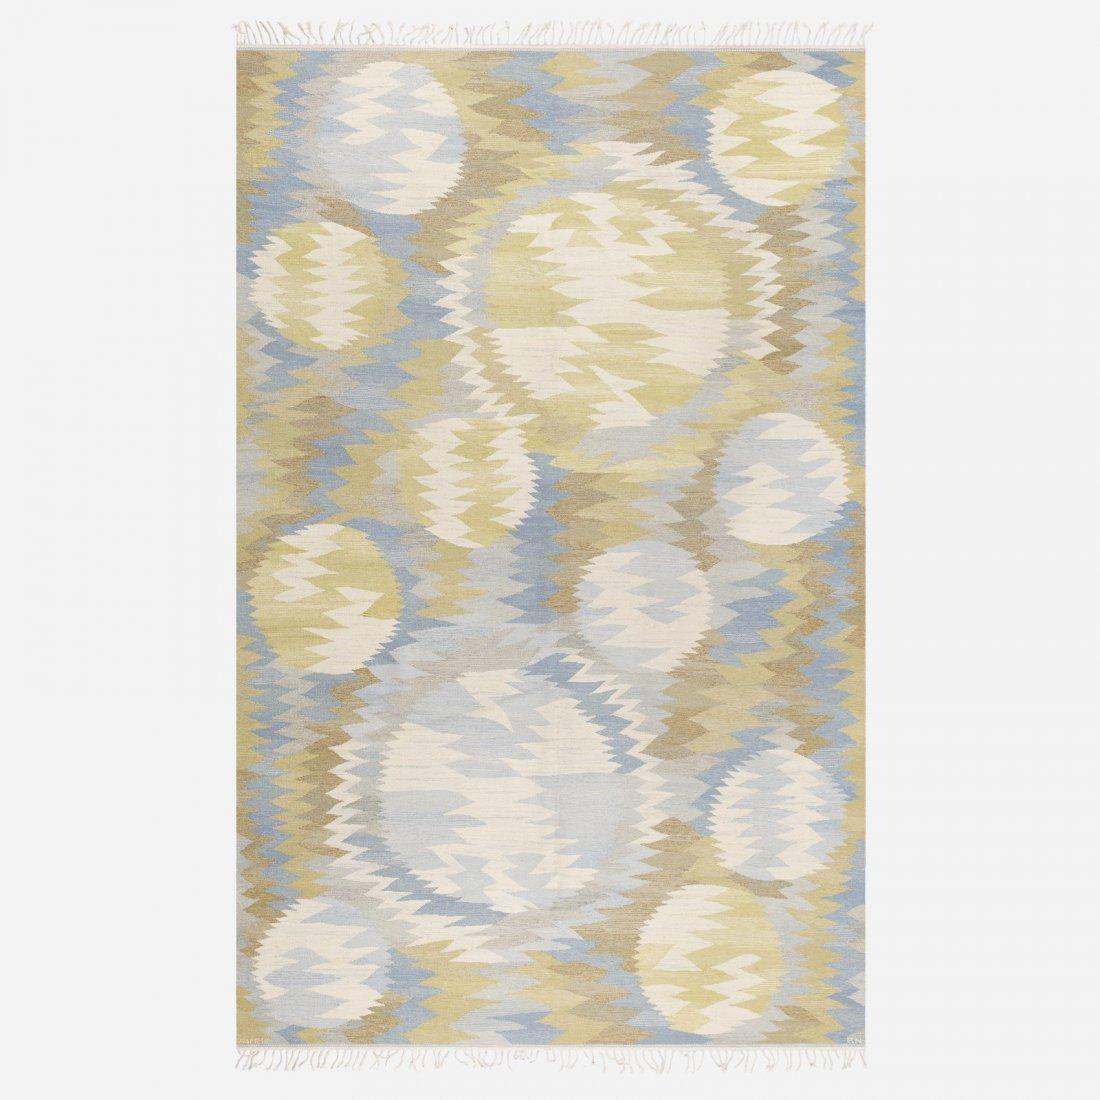 Barbro Nilsson, Solflackar tapestry weave carpet